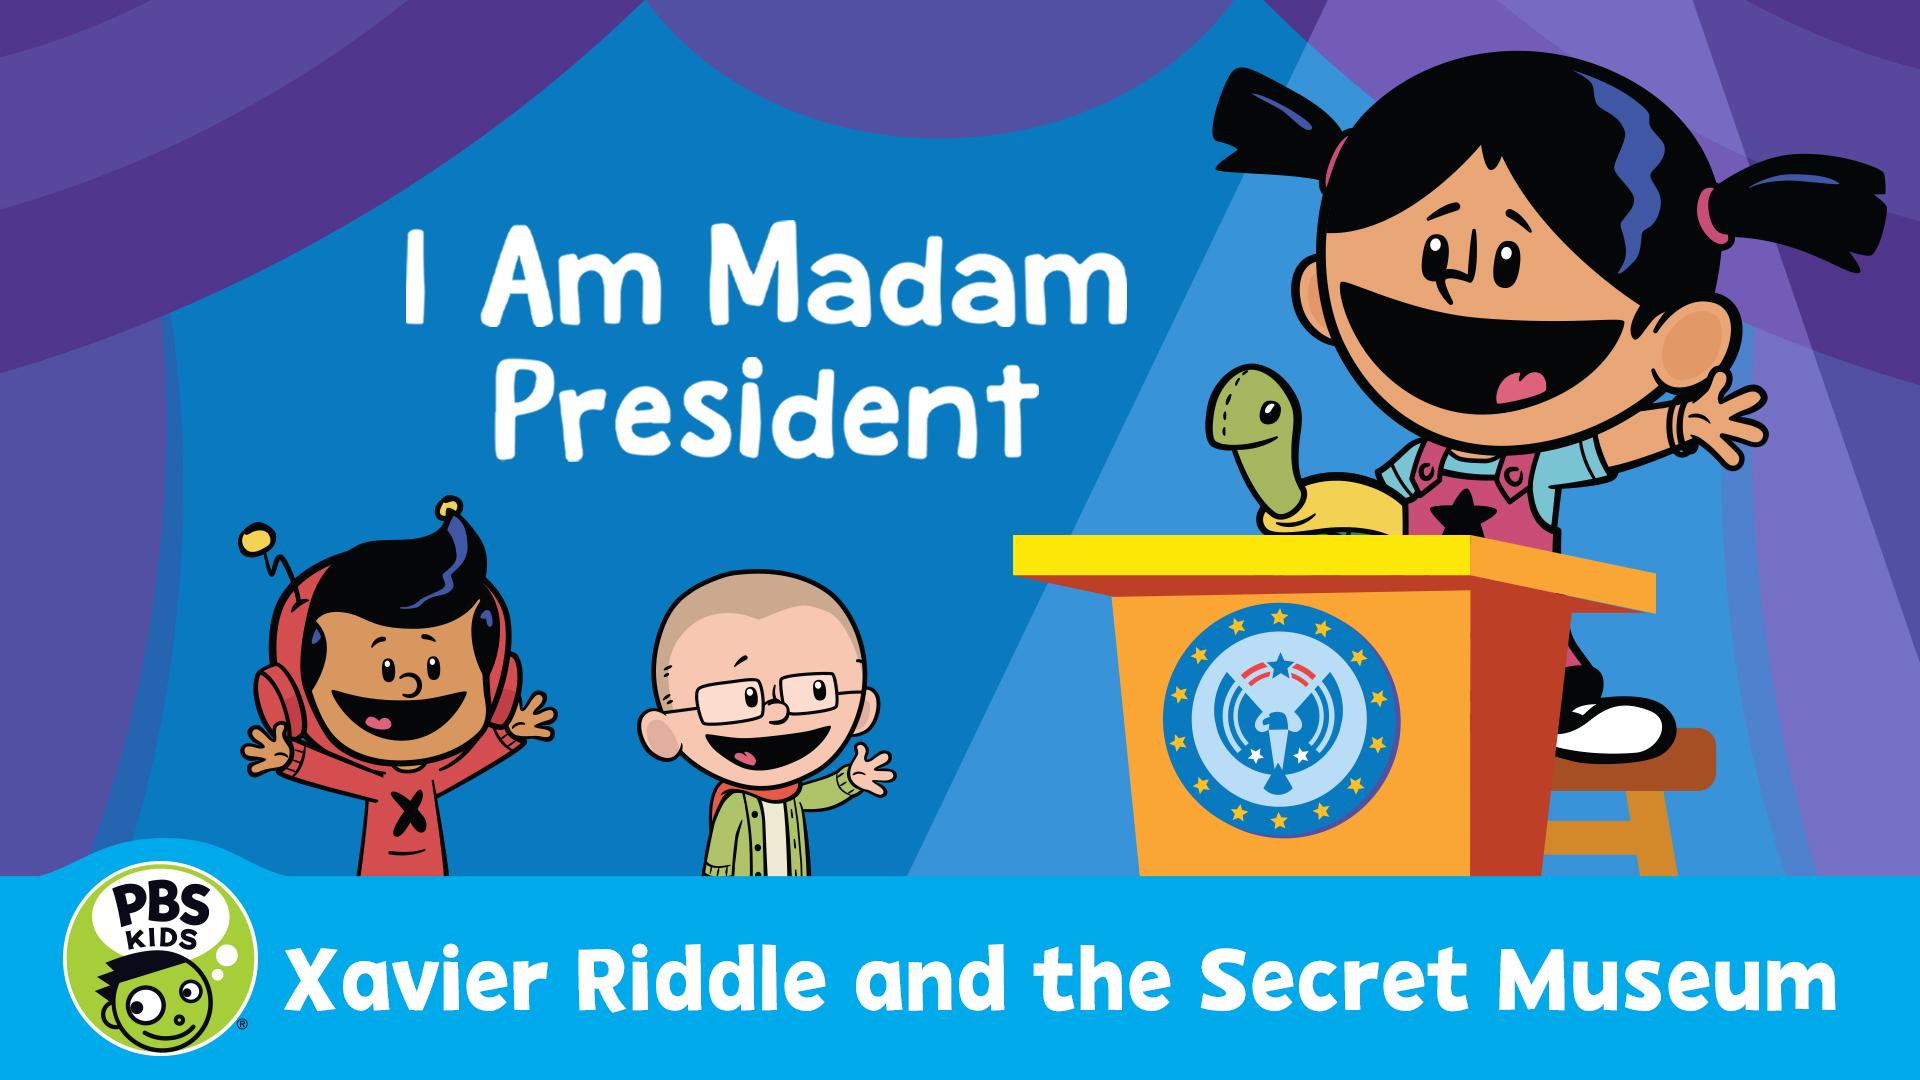 Xavier Riddle and the Secret Movie: I am Madam President